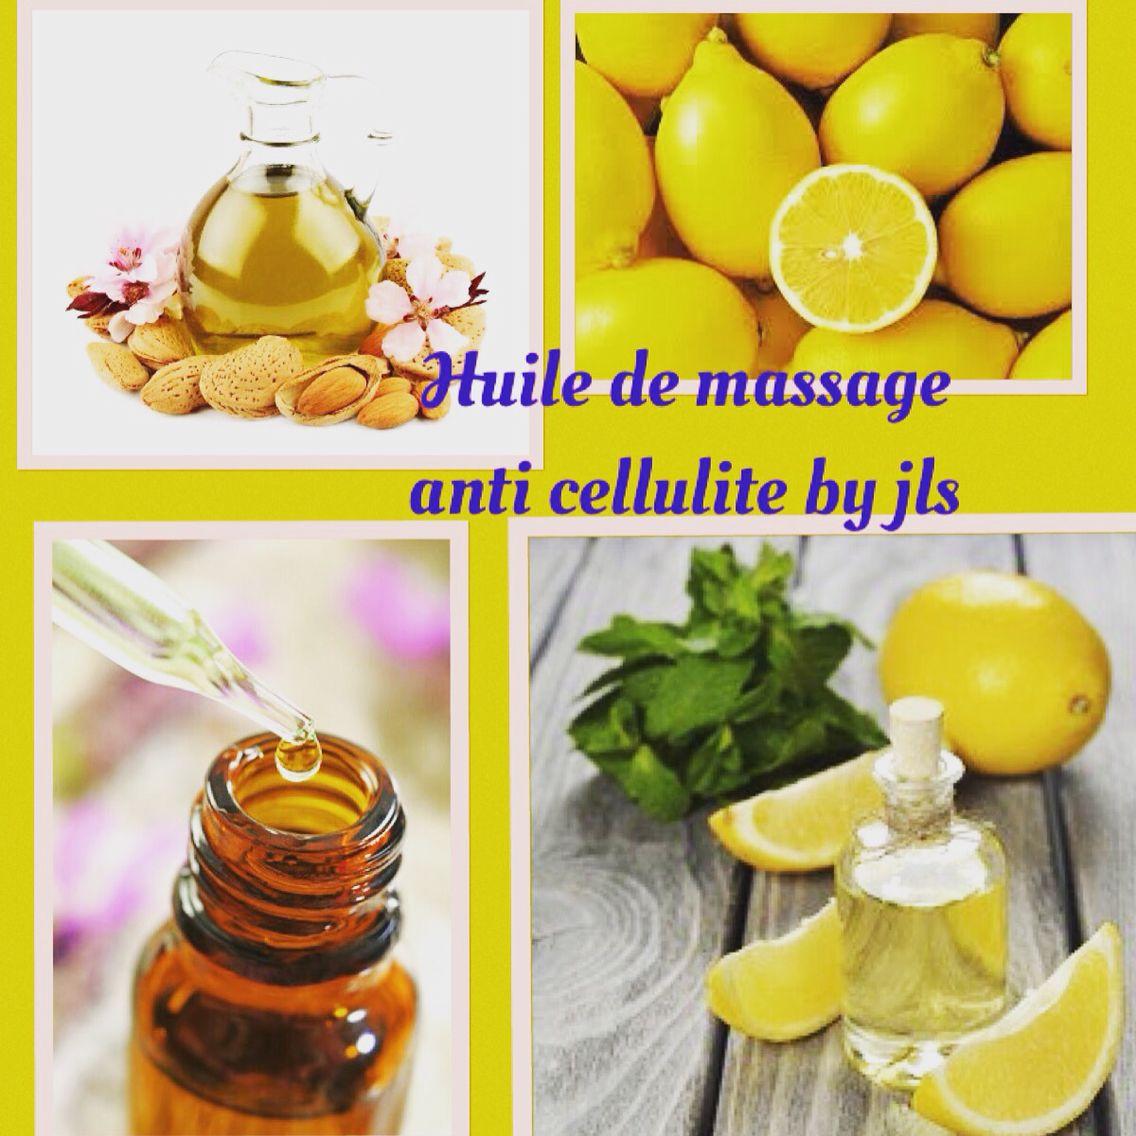 anti cellulite maison citron